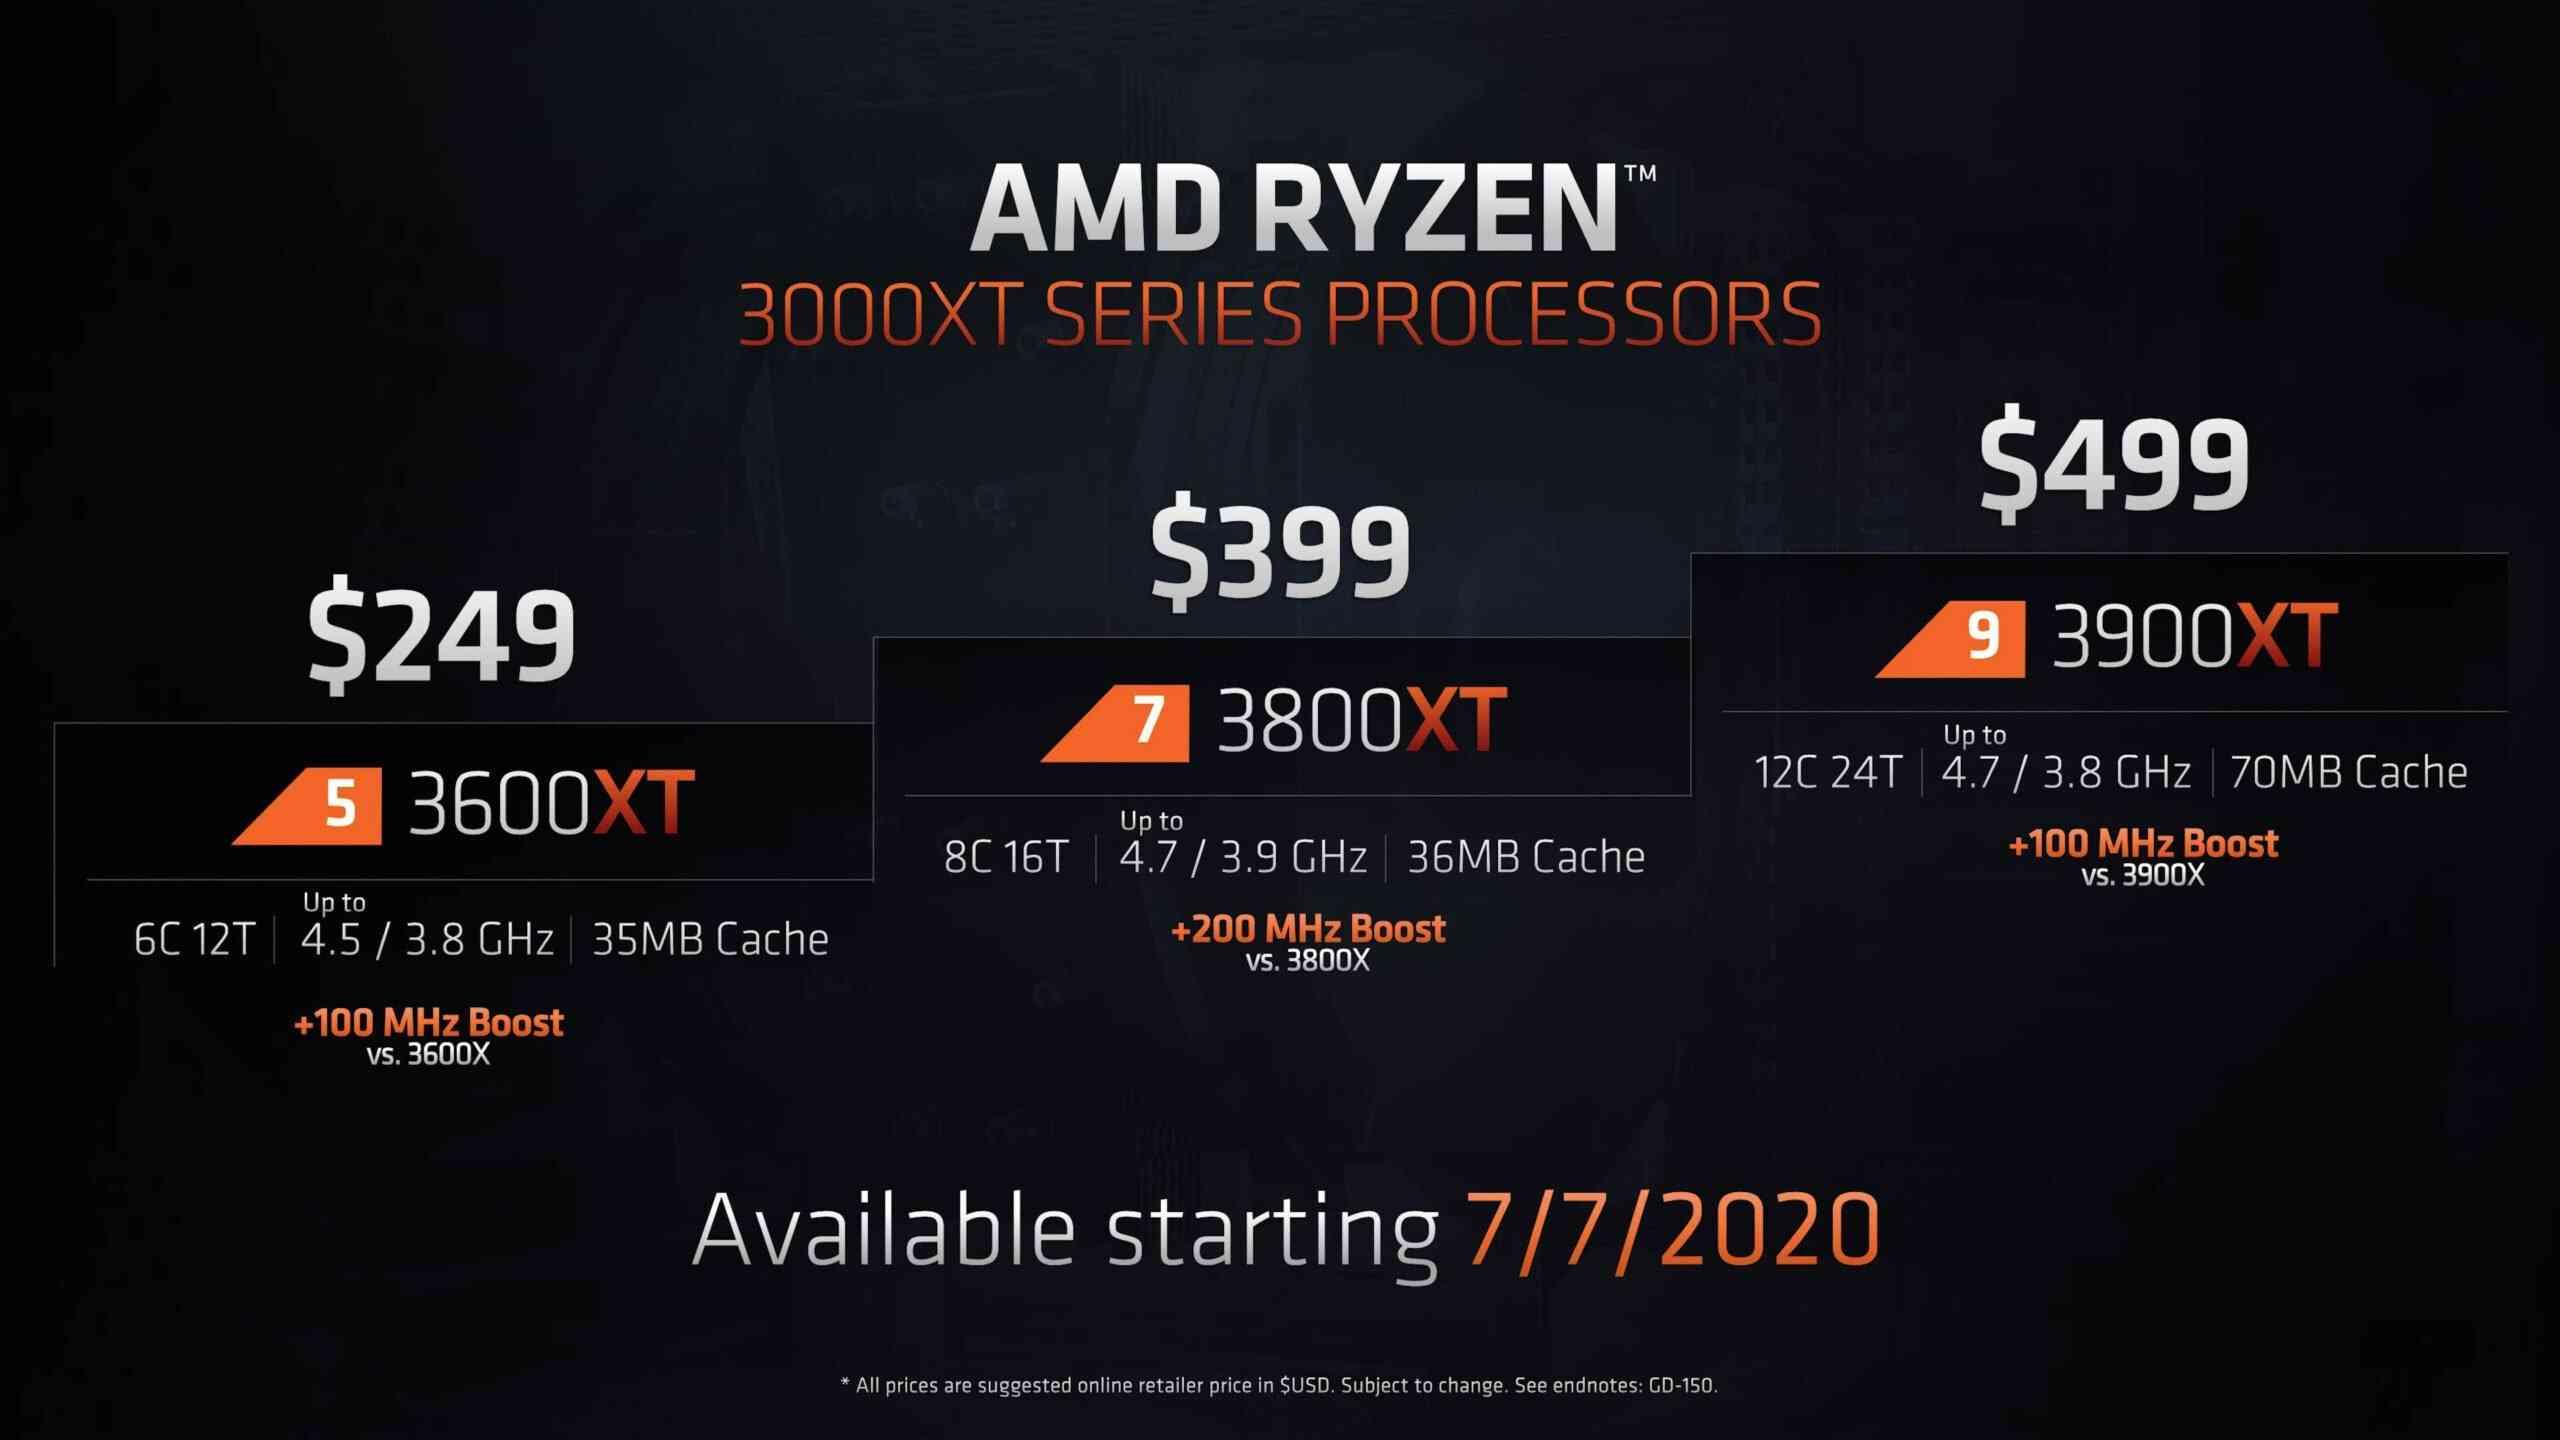 AMD Ryzen 3000XT CPUs Specs, price and launch dates